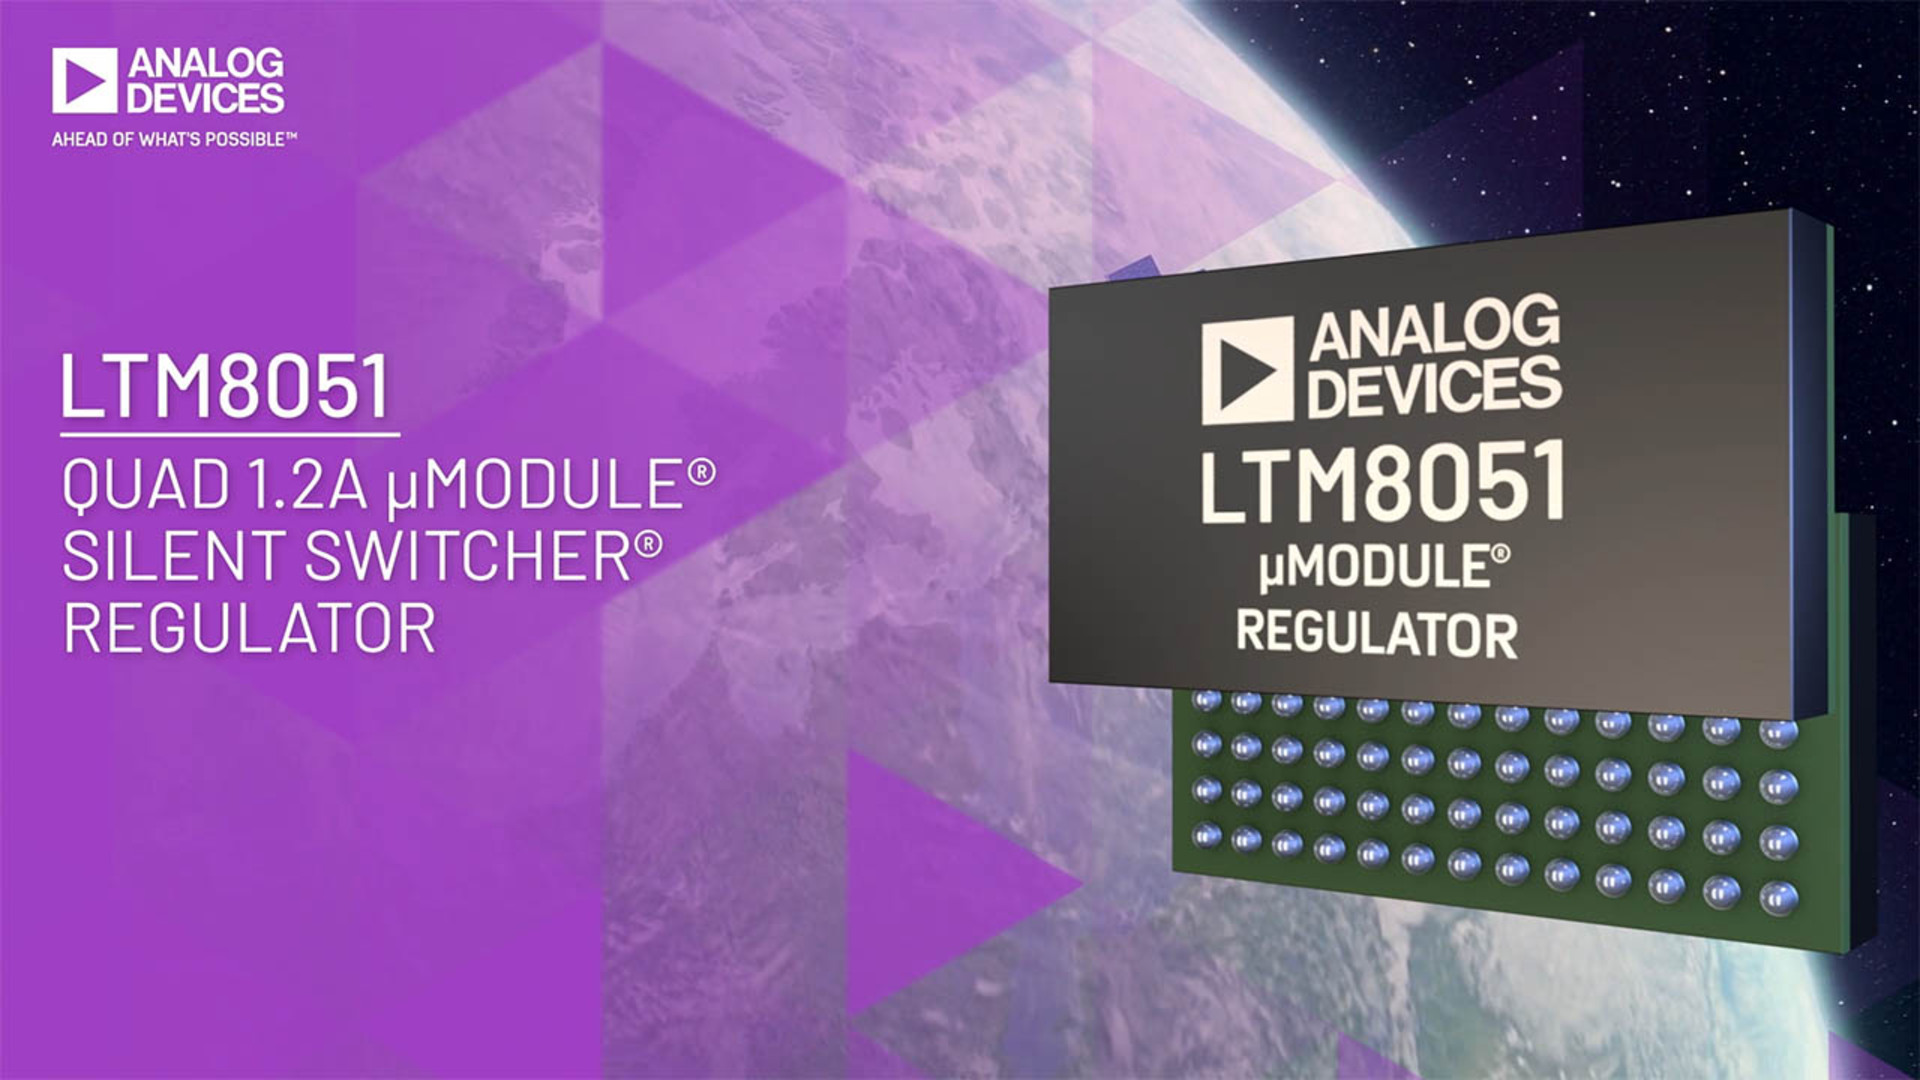 LTM8051: Silent Switcher® μModule® Regulator